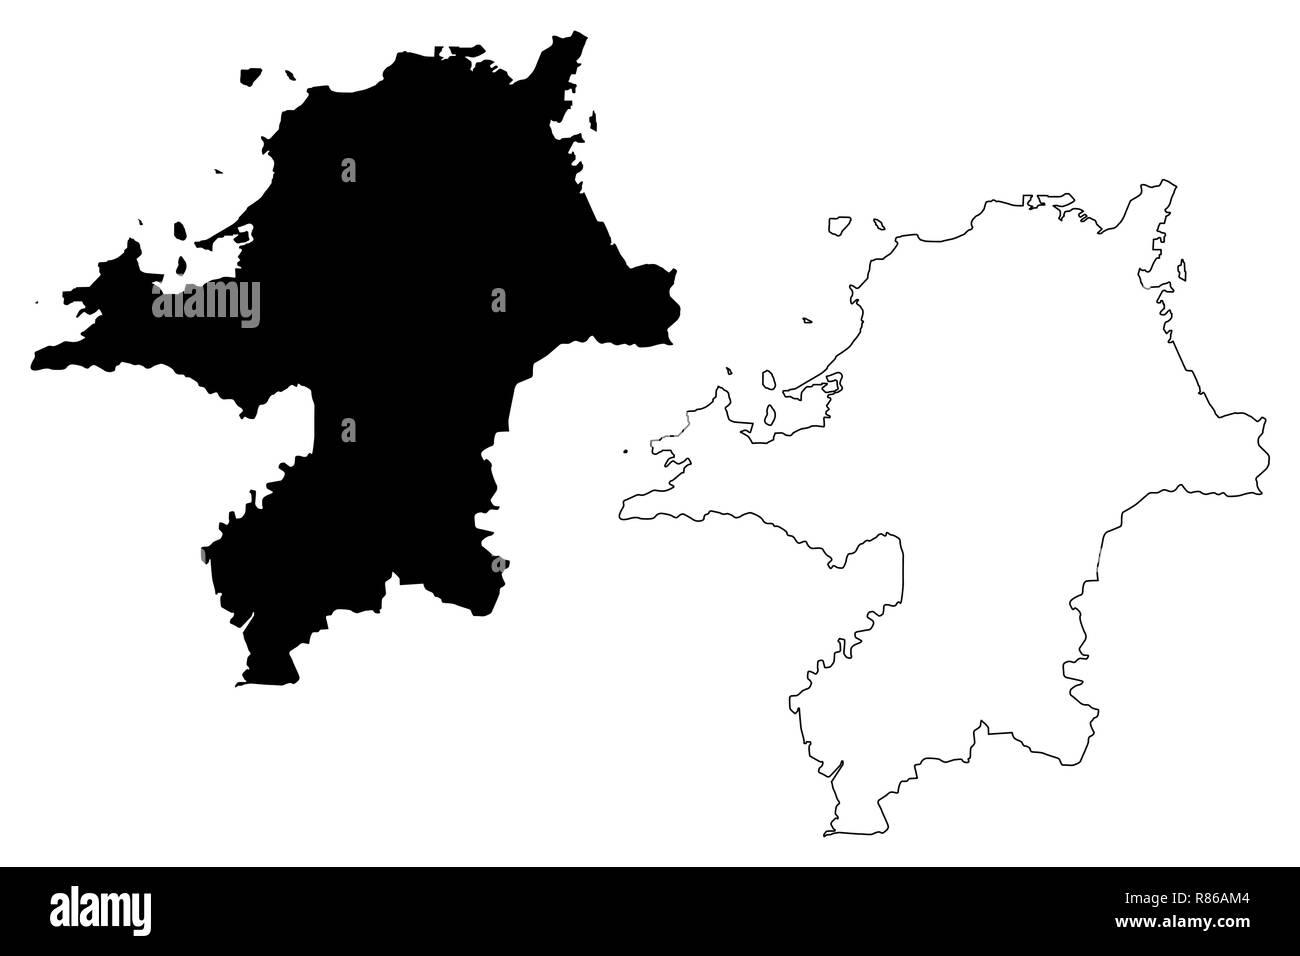 Fukuoka Prefecture Administrative Divisions Of Japan Prefectures Of Japan Map Vector Illustration Scribble Sketch Fukuoka Map Stock Vector Image Art Alamy